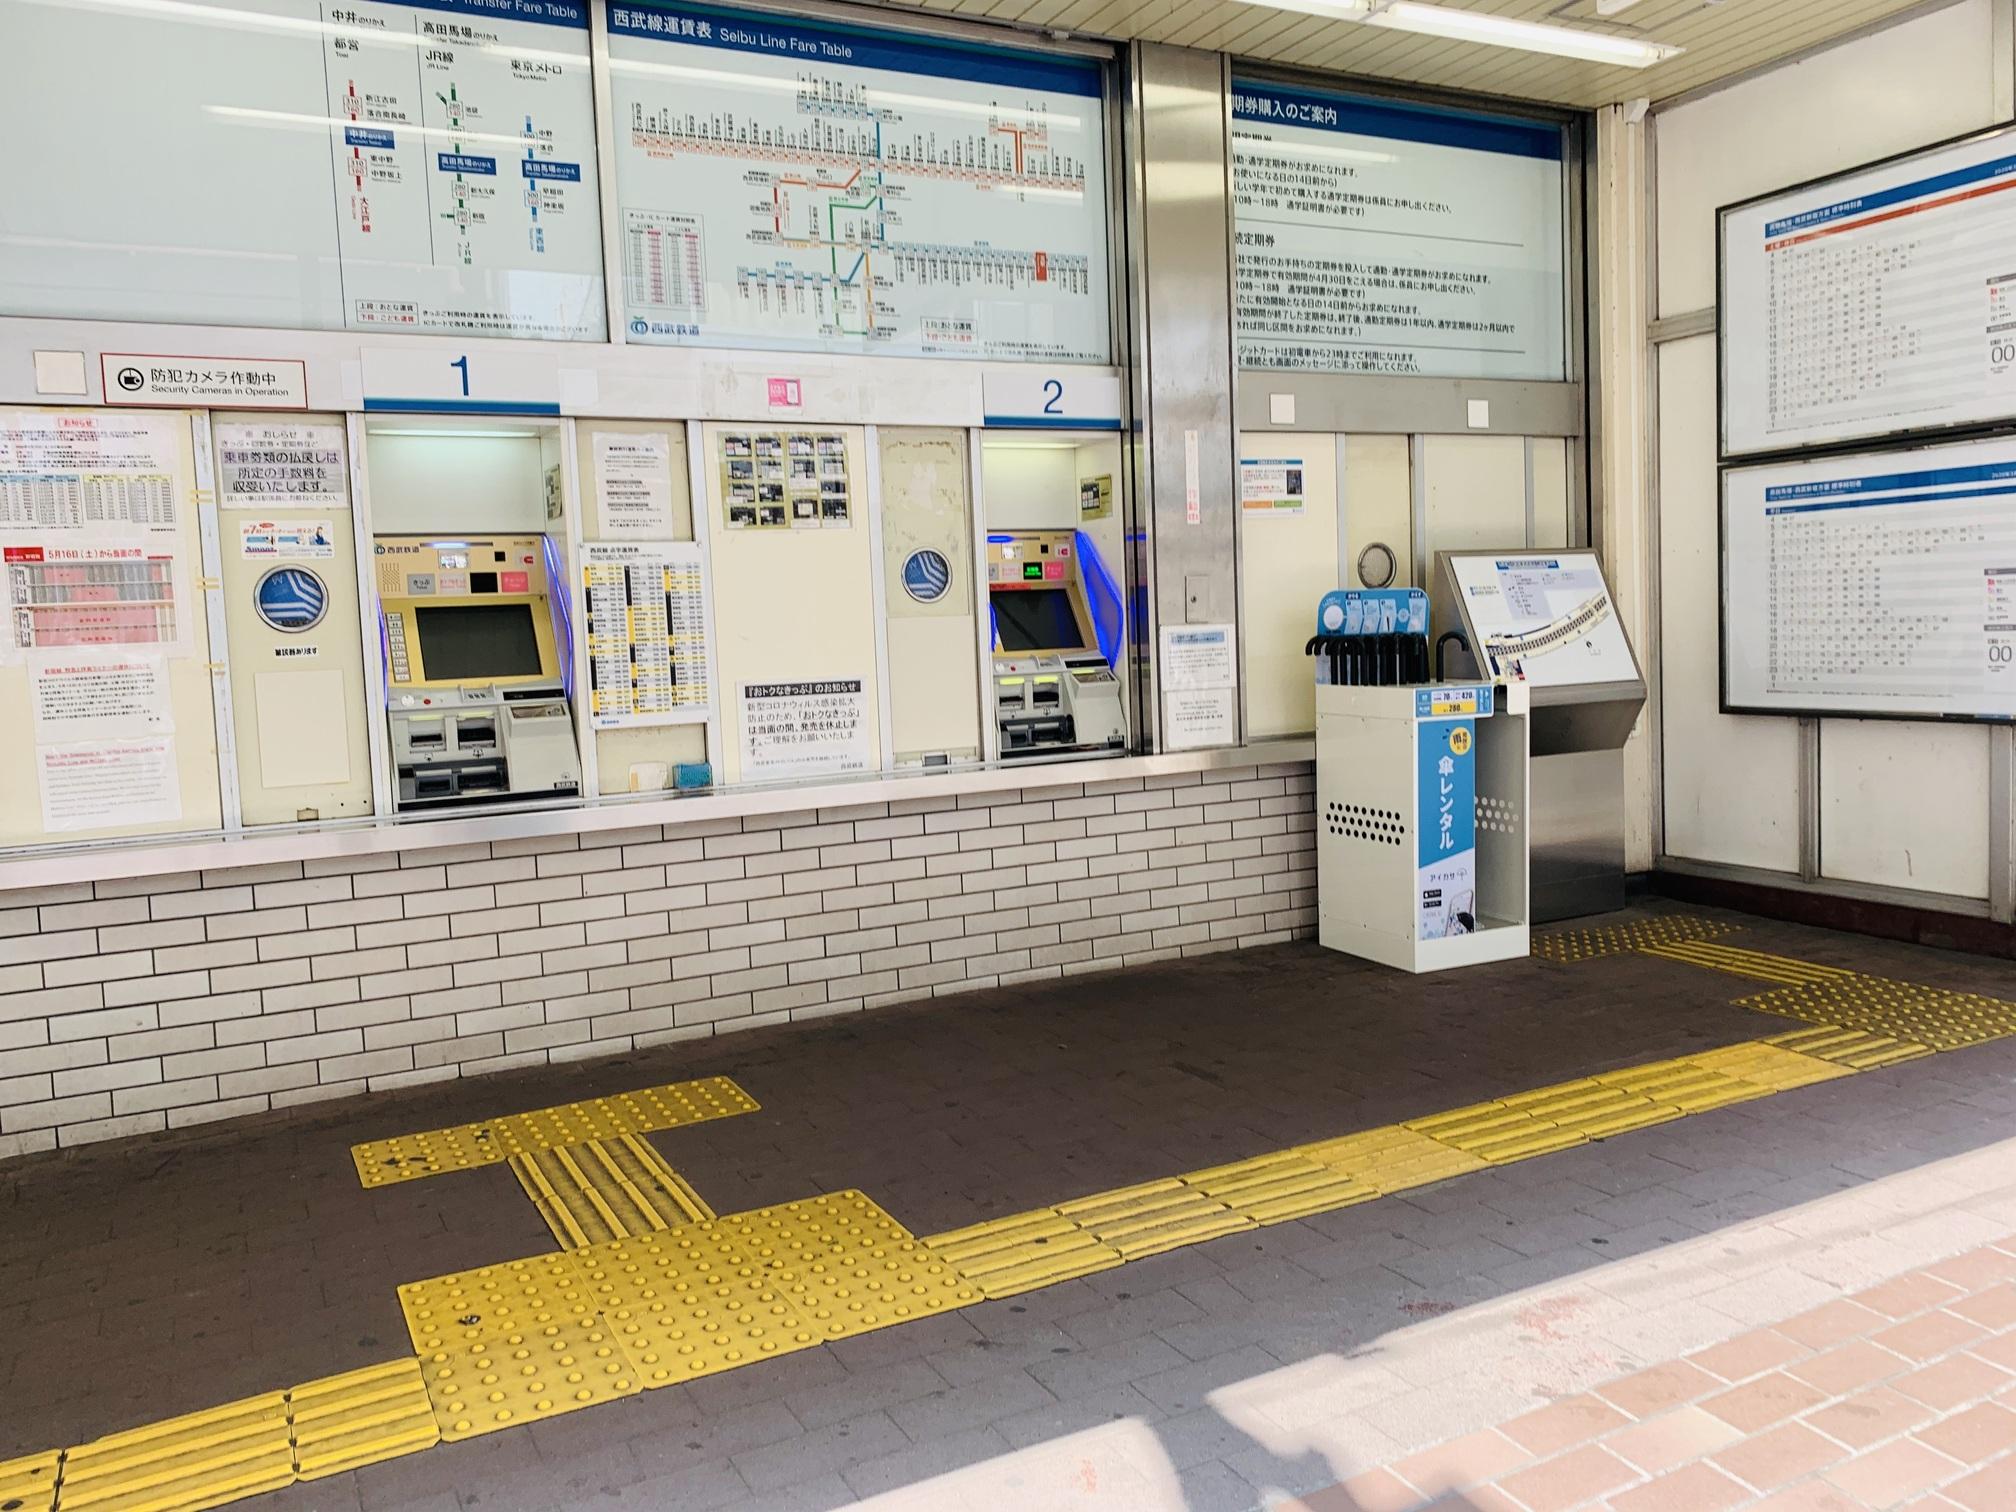 アイカサ 西武新宿線 新井薬師前駅南口